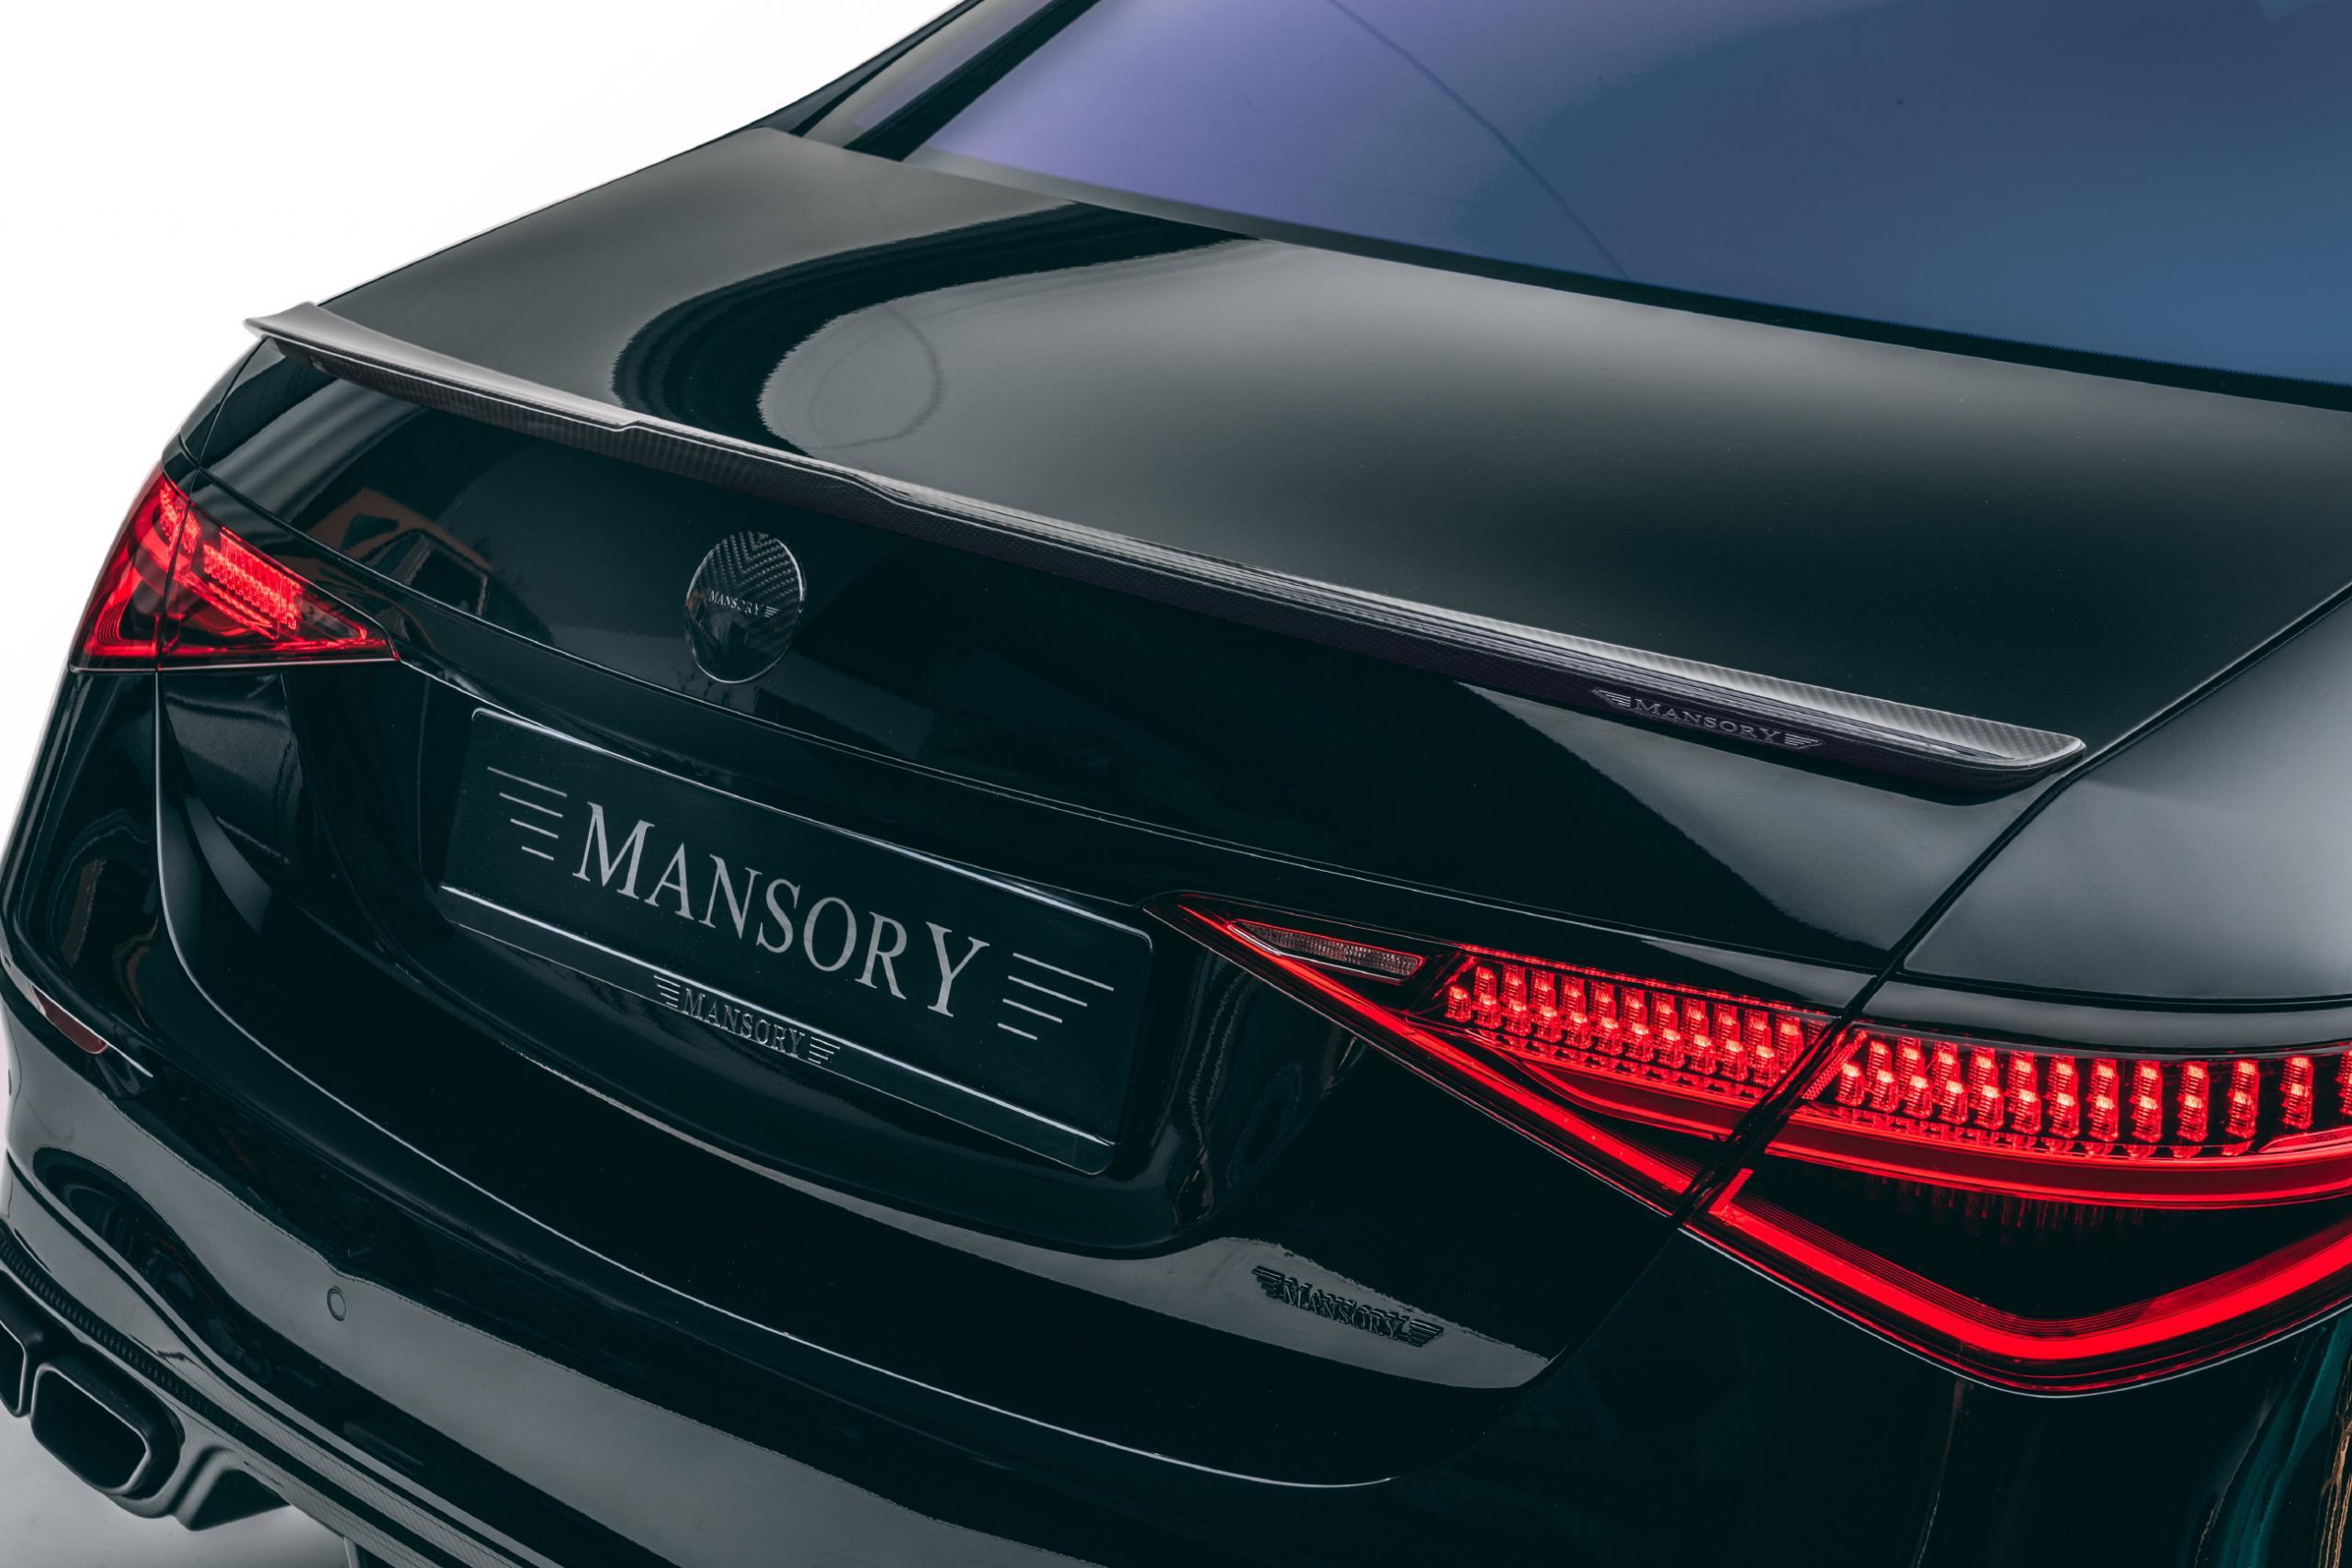 mansory w223 mercedes s class body kit carbon fiber sport rear deck lid spoiler trunk wing 2021 2022 2023